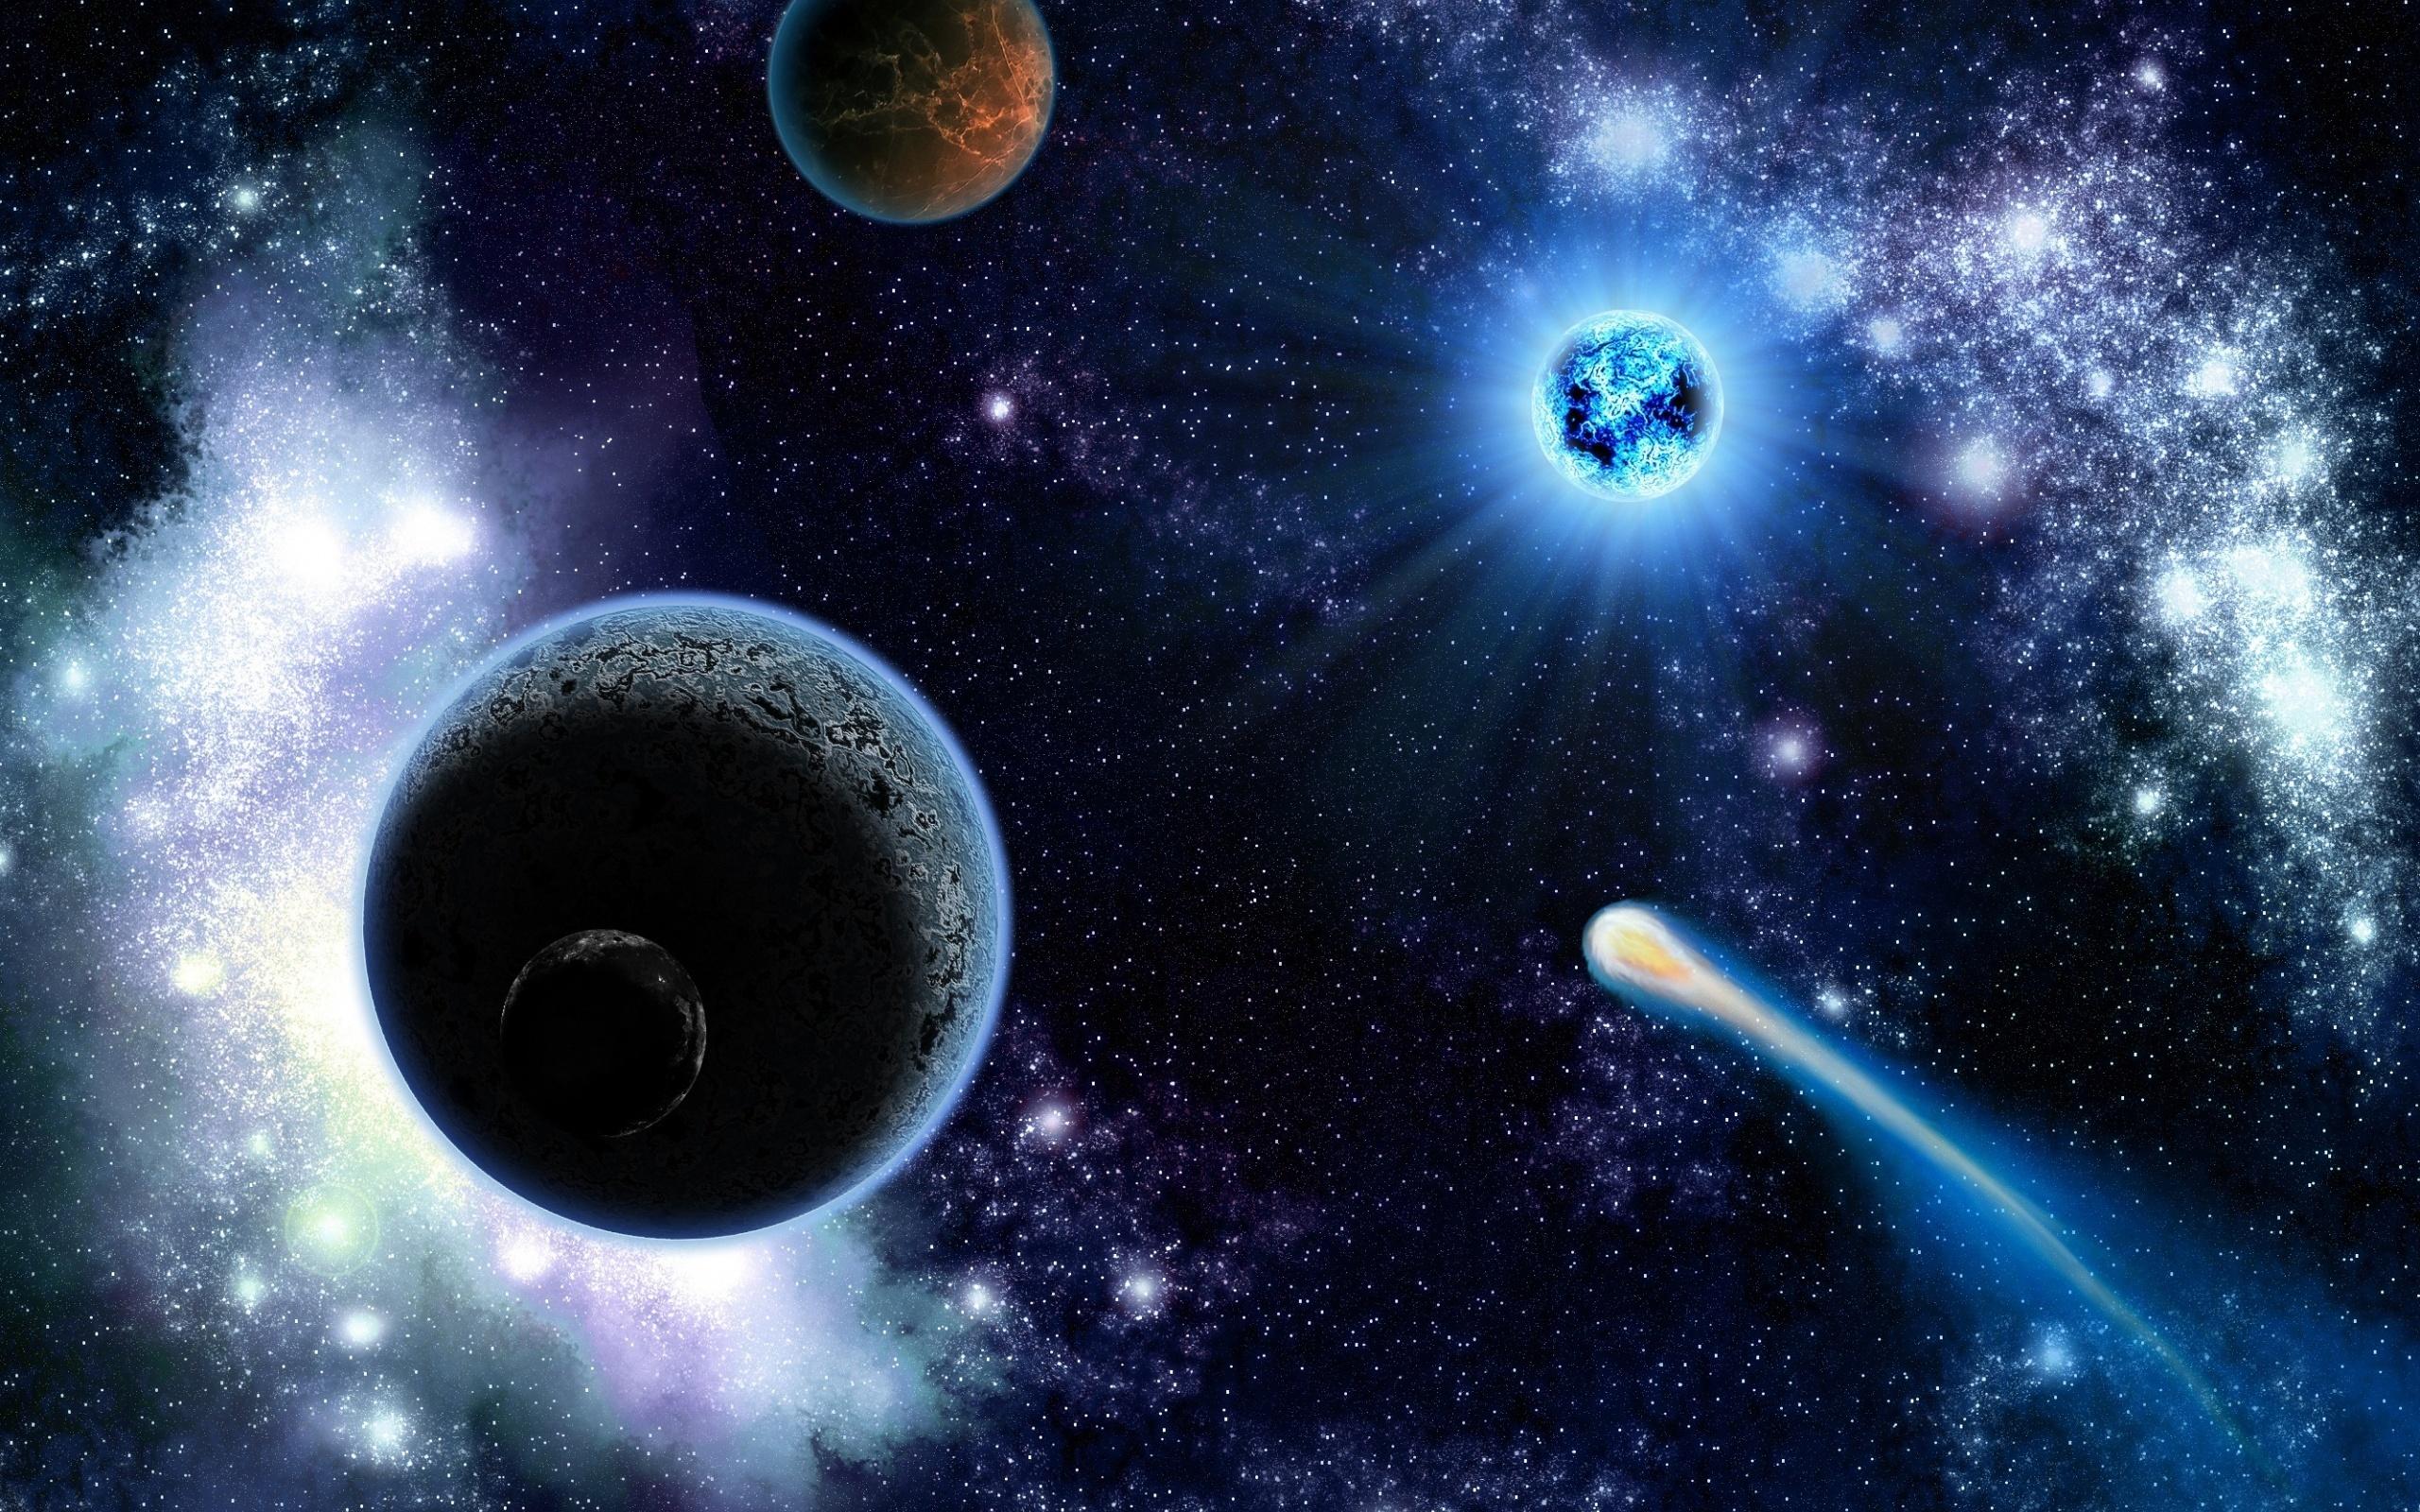 Planets Computer Wallpapers, Desktop Backgrounds ...